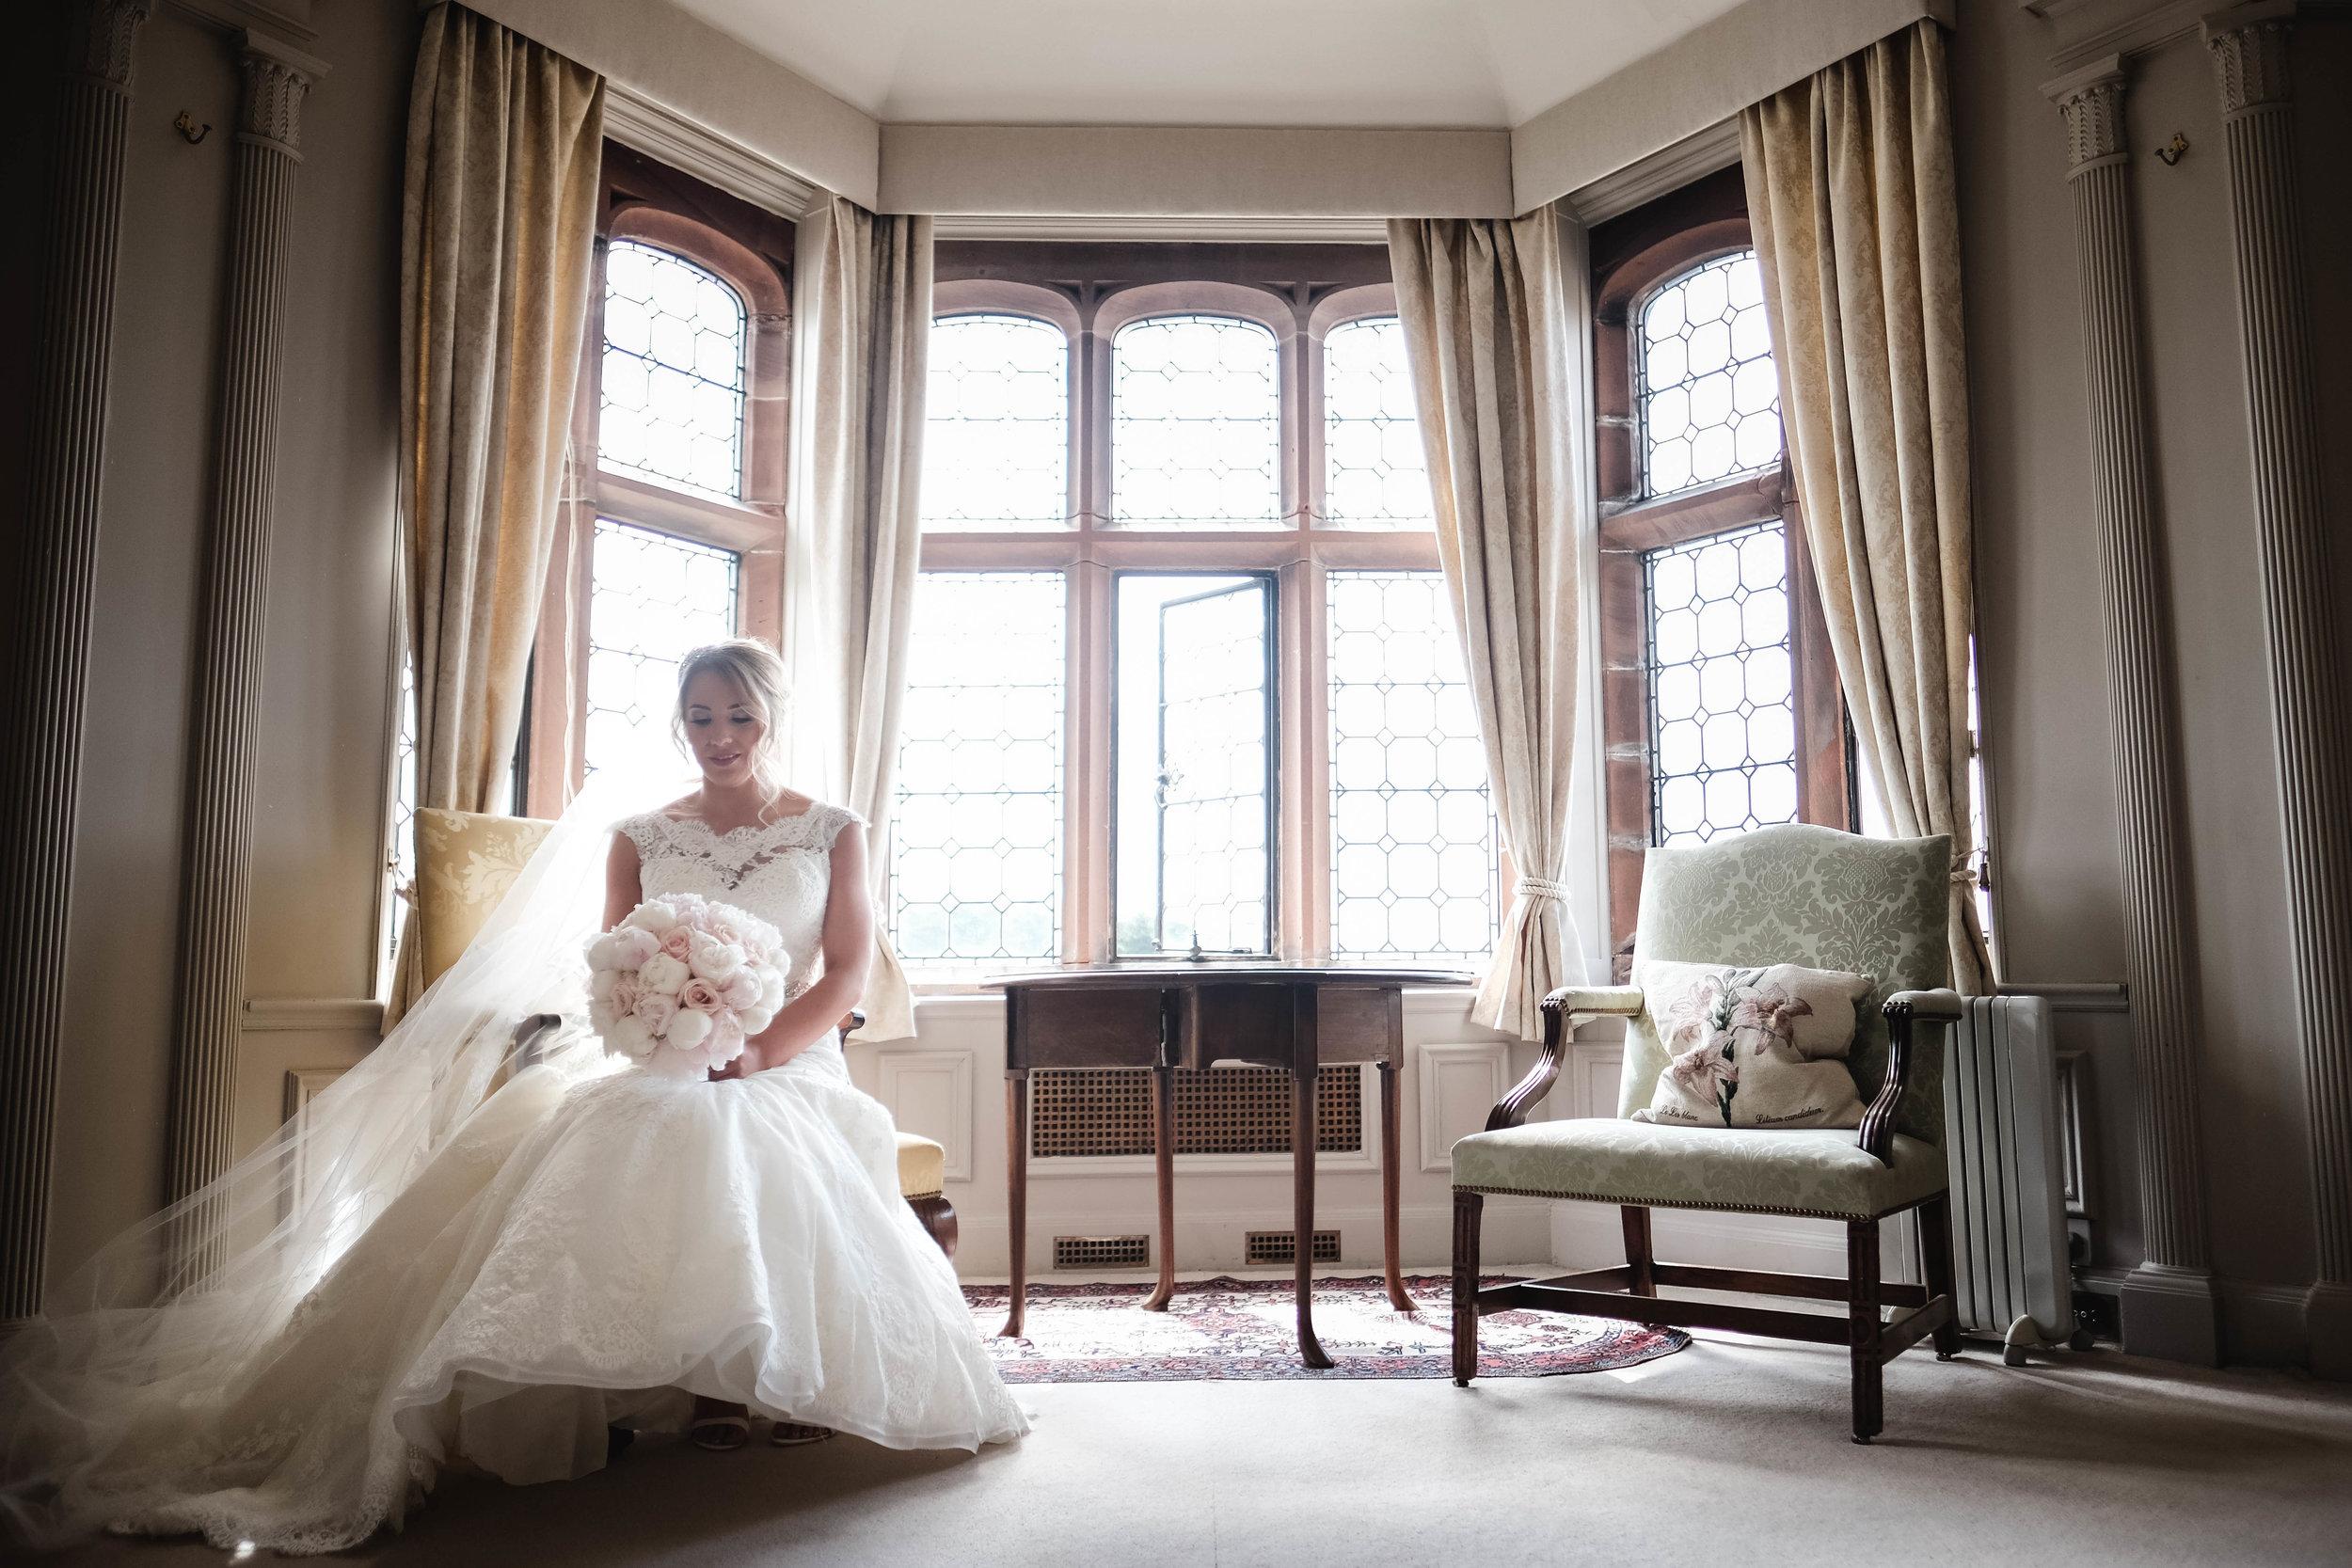 Thornton manor wedding photography cheshire wedding photographer liverpool manchester warrington chester wirral wedding BLOG (29 of 108).jpg